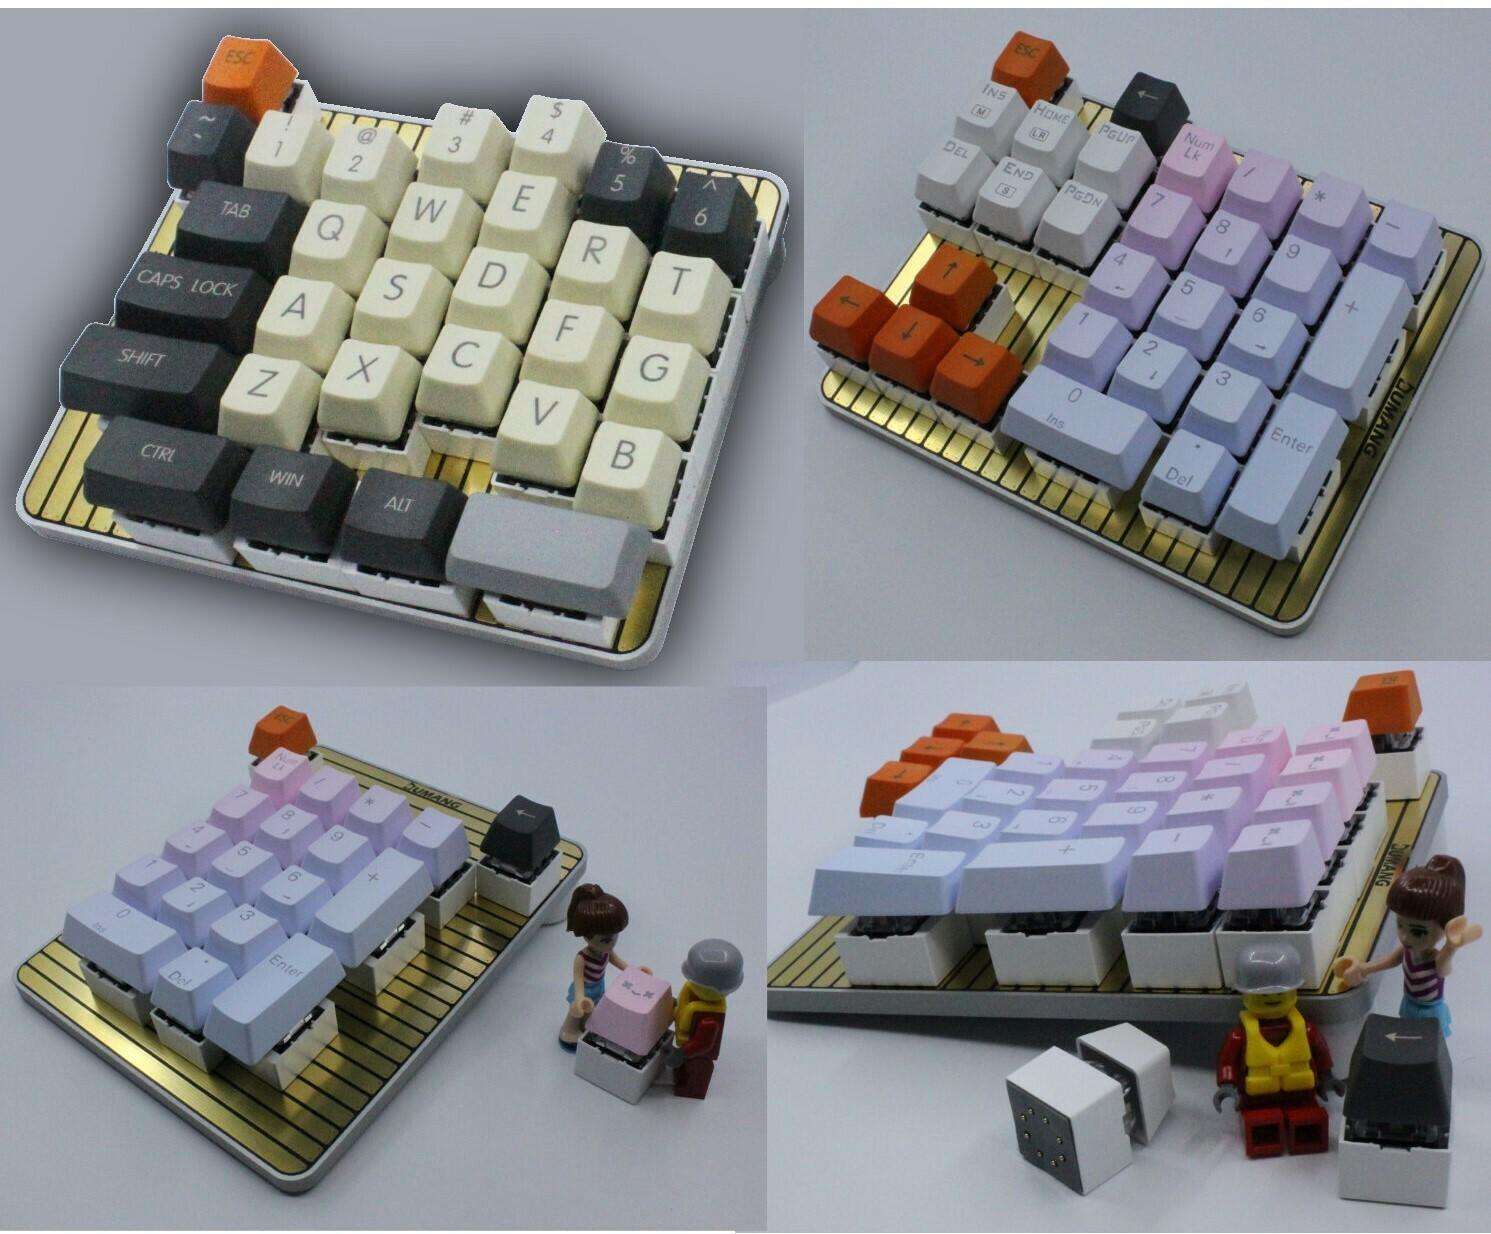 DUMANG DK6 mini Keyboard (Cherry KeySwitch)